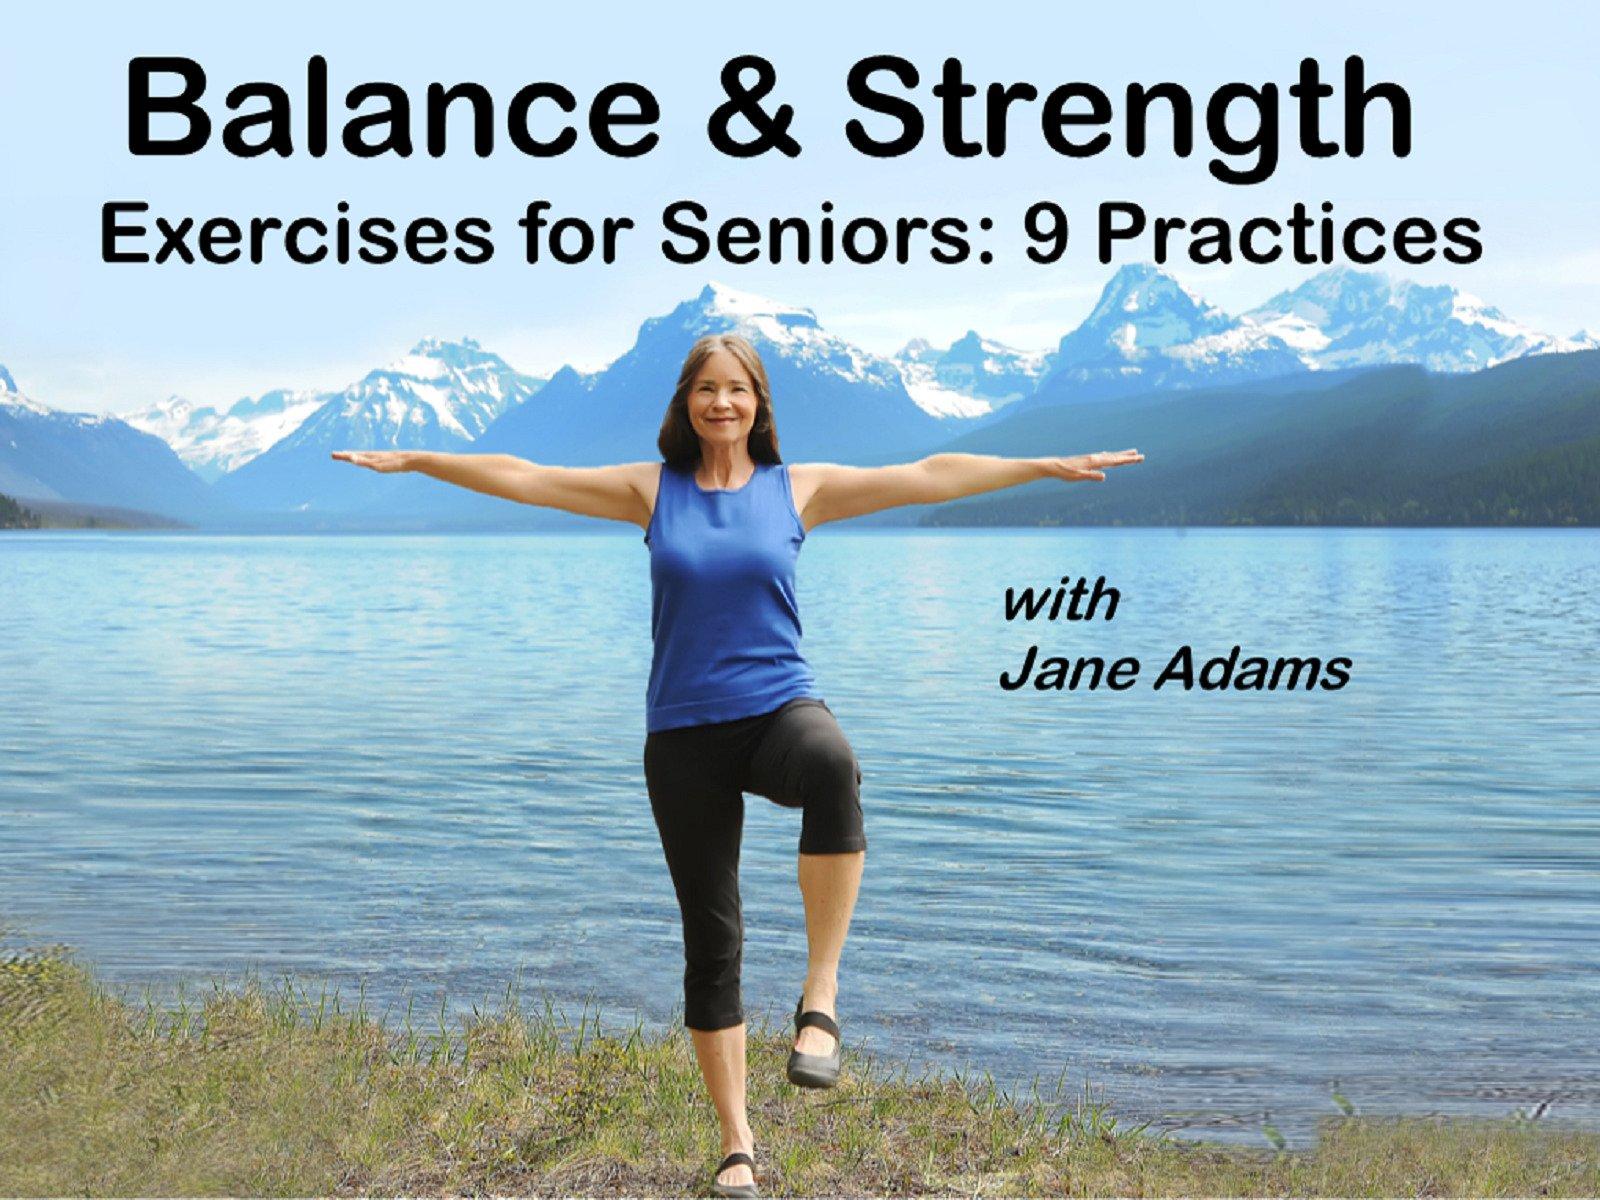 Amazon.com: Balance & Strength Exercises for Seniors: 9 Practices ...